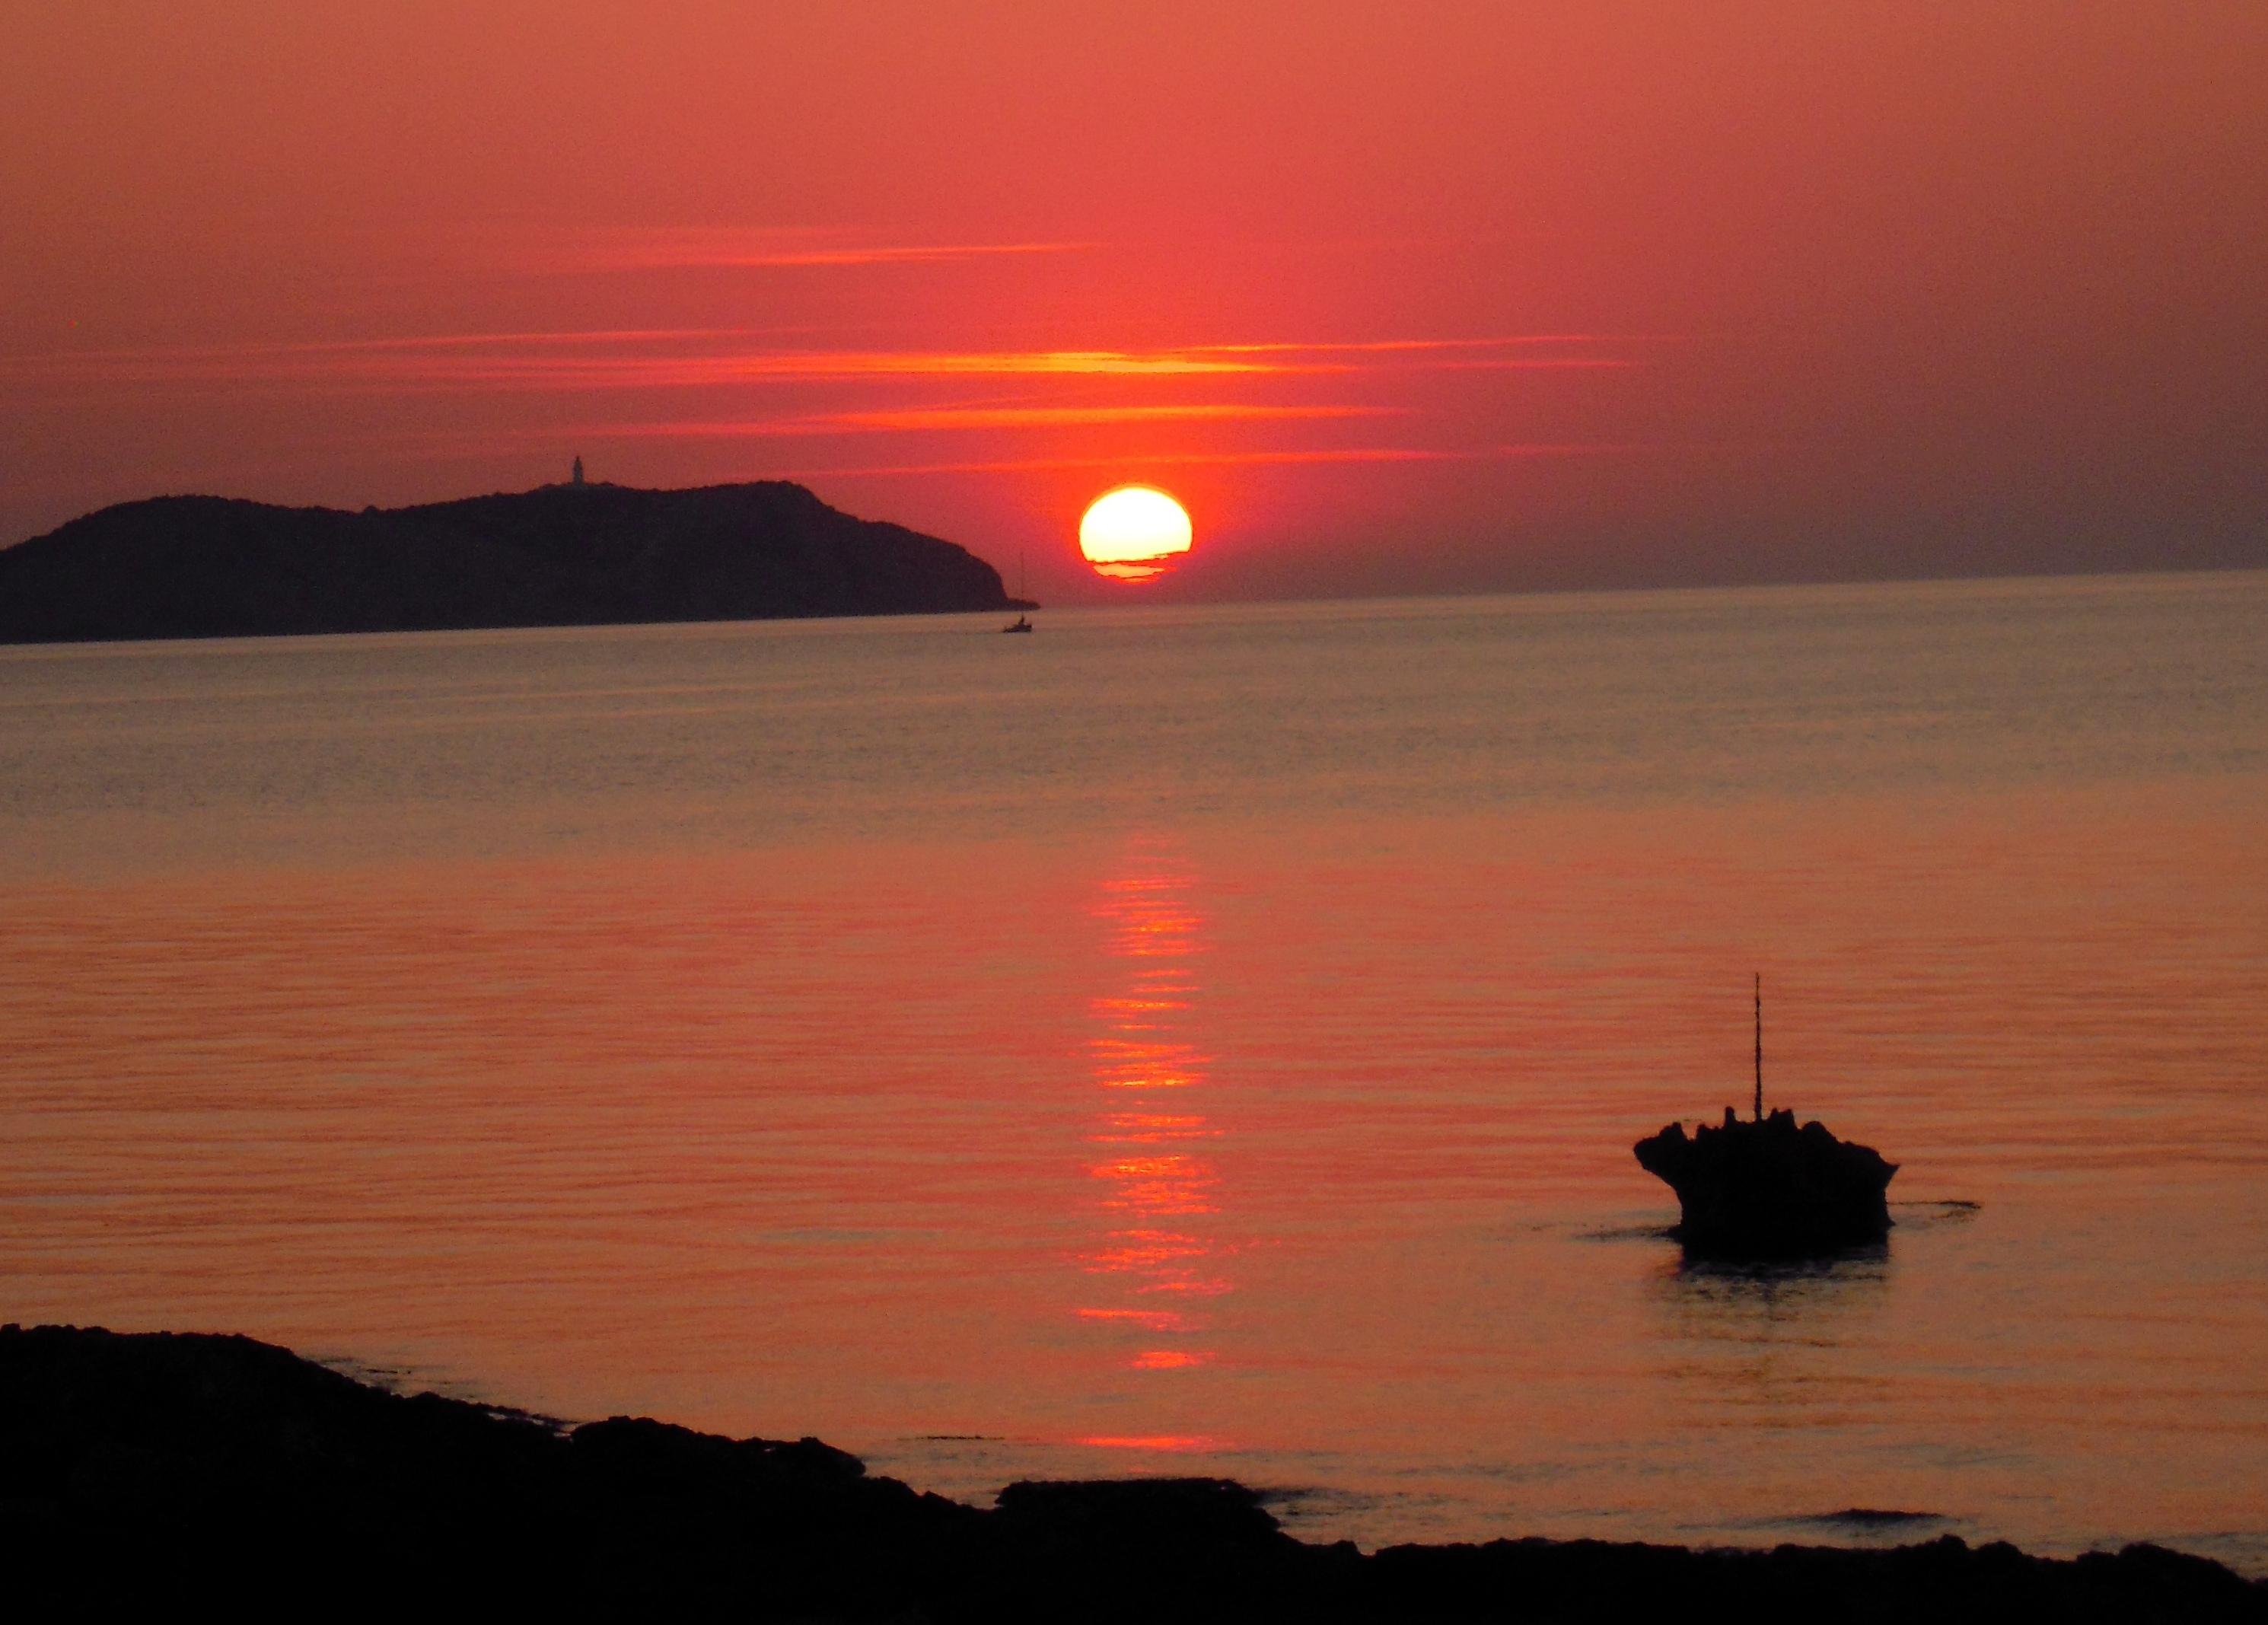 Sunset_across_Port_des_Torrent_San_Antonio_Bay_29_May_2012